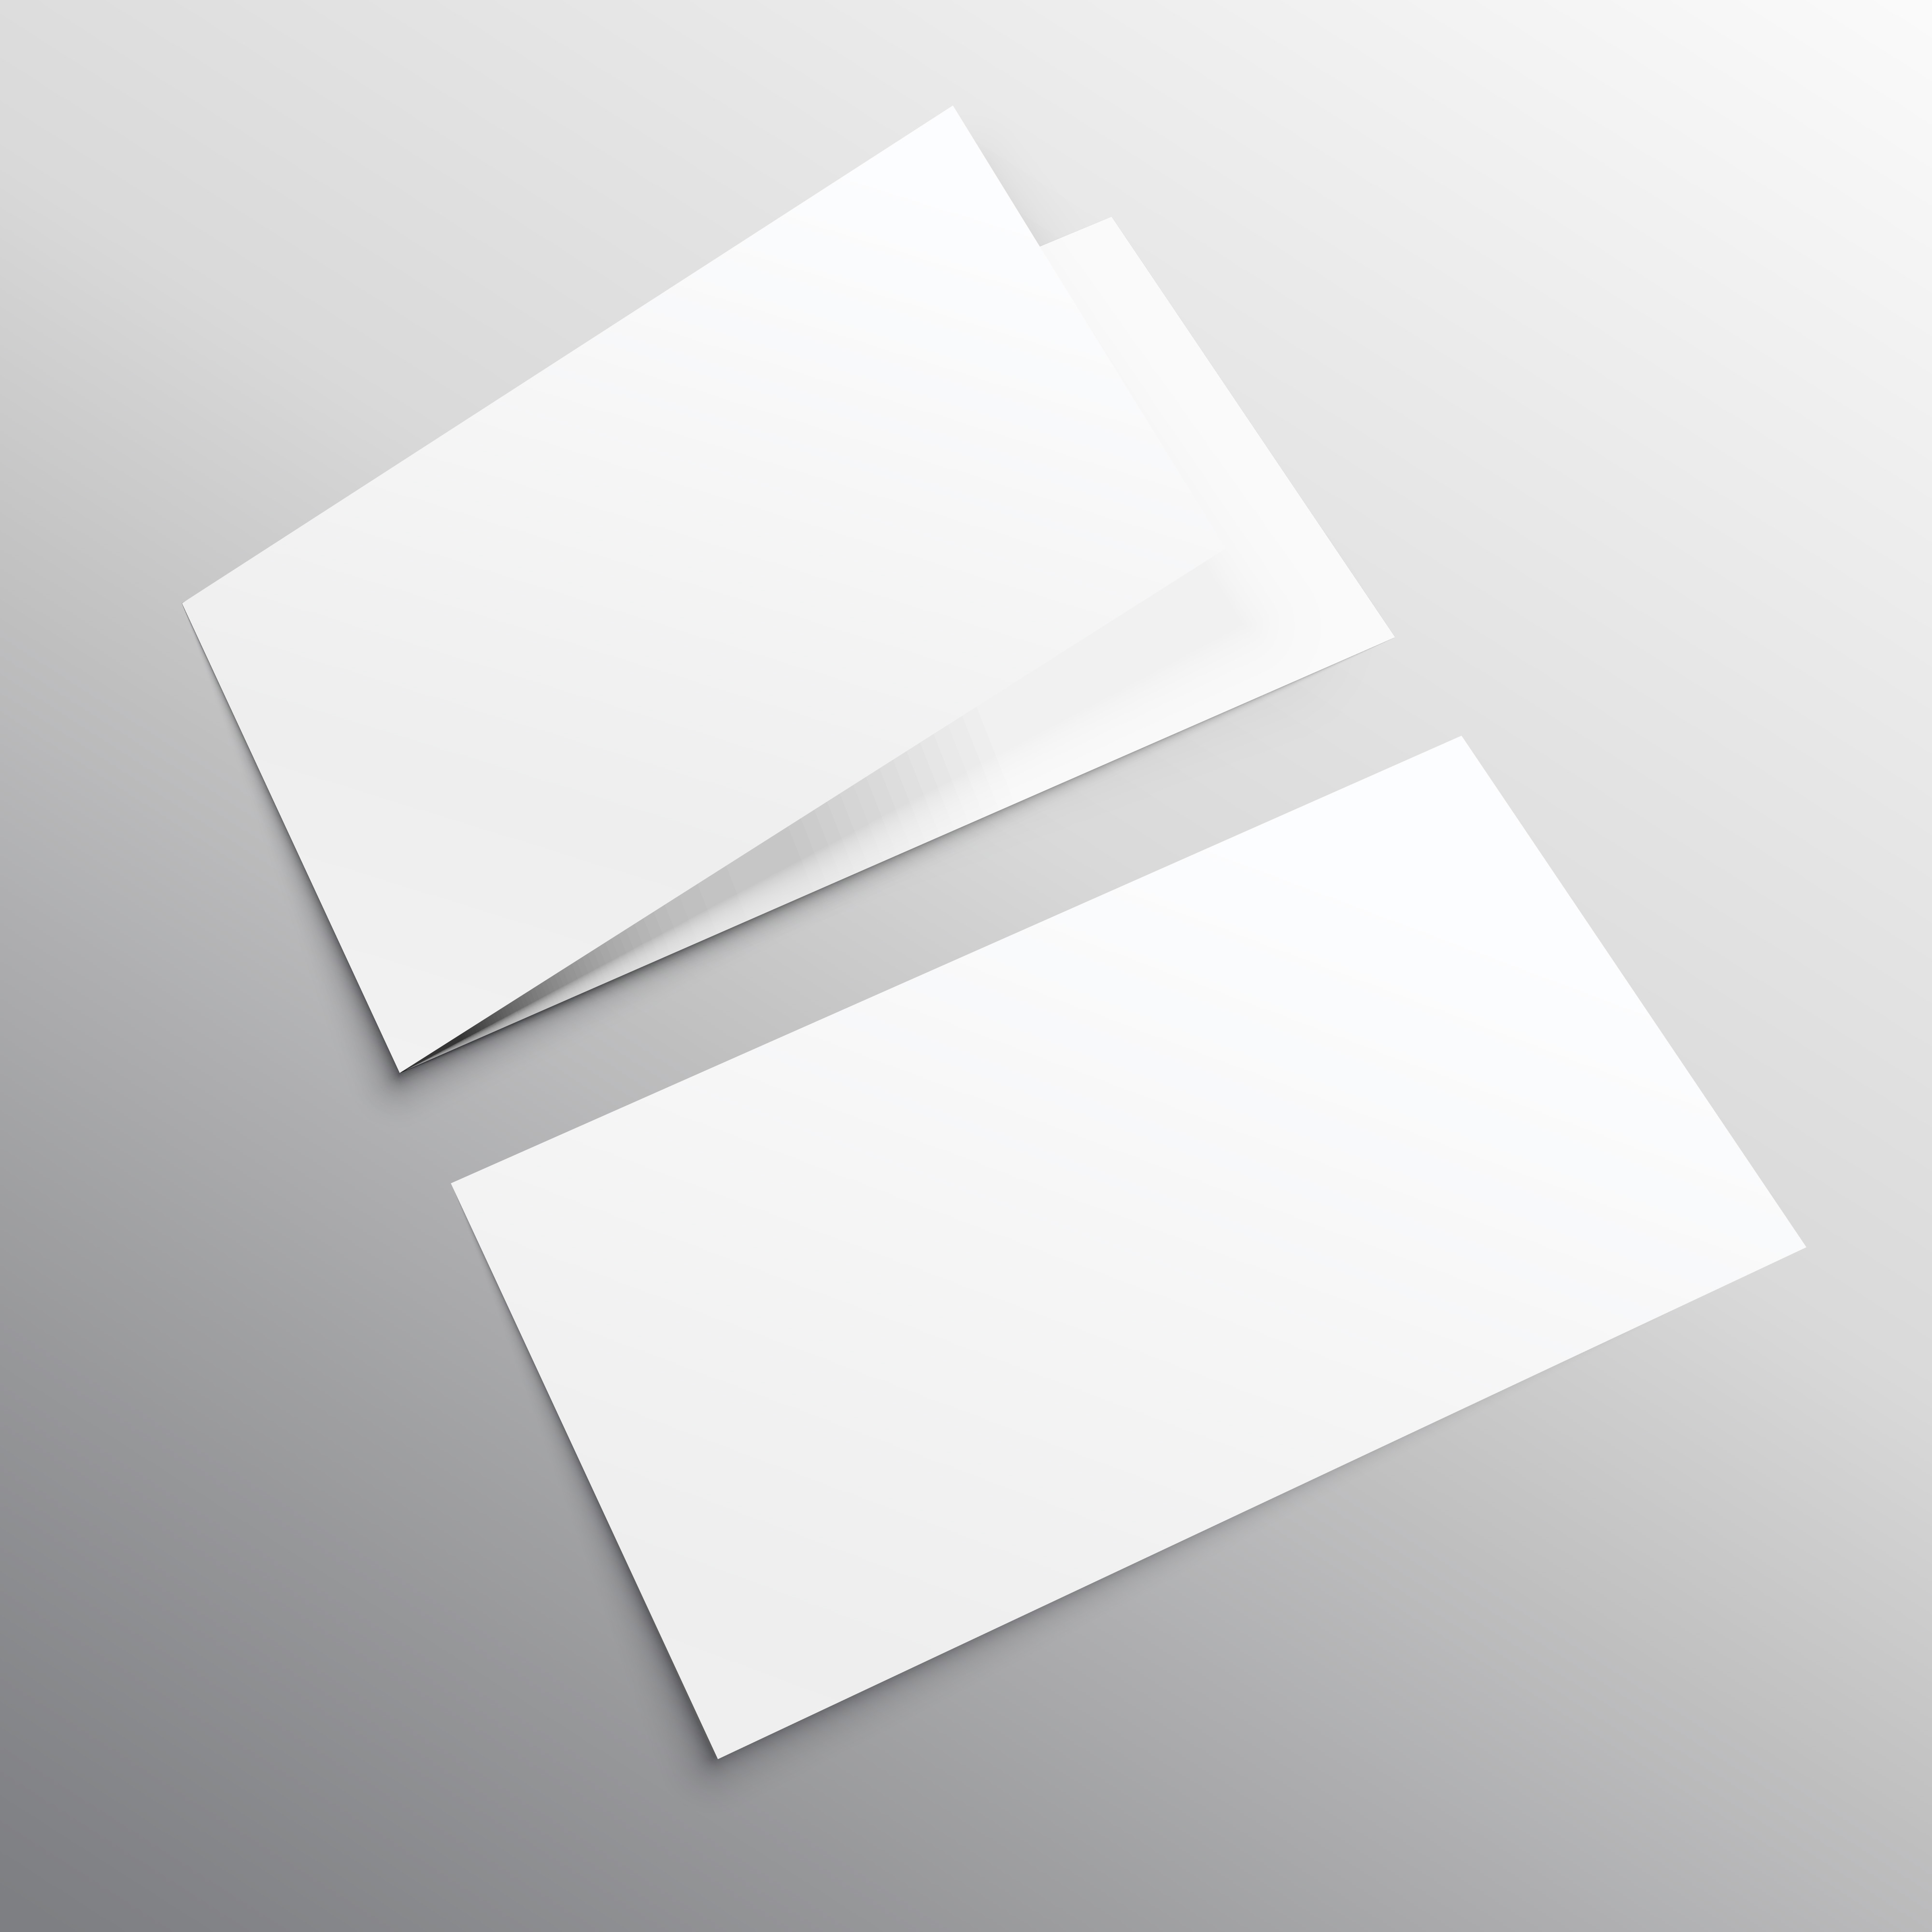 bifold horizontal empty brochure mockup design template - Kostenlose ...